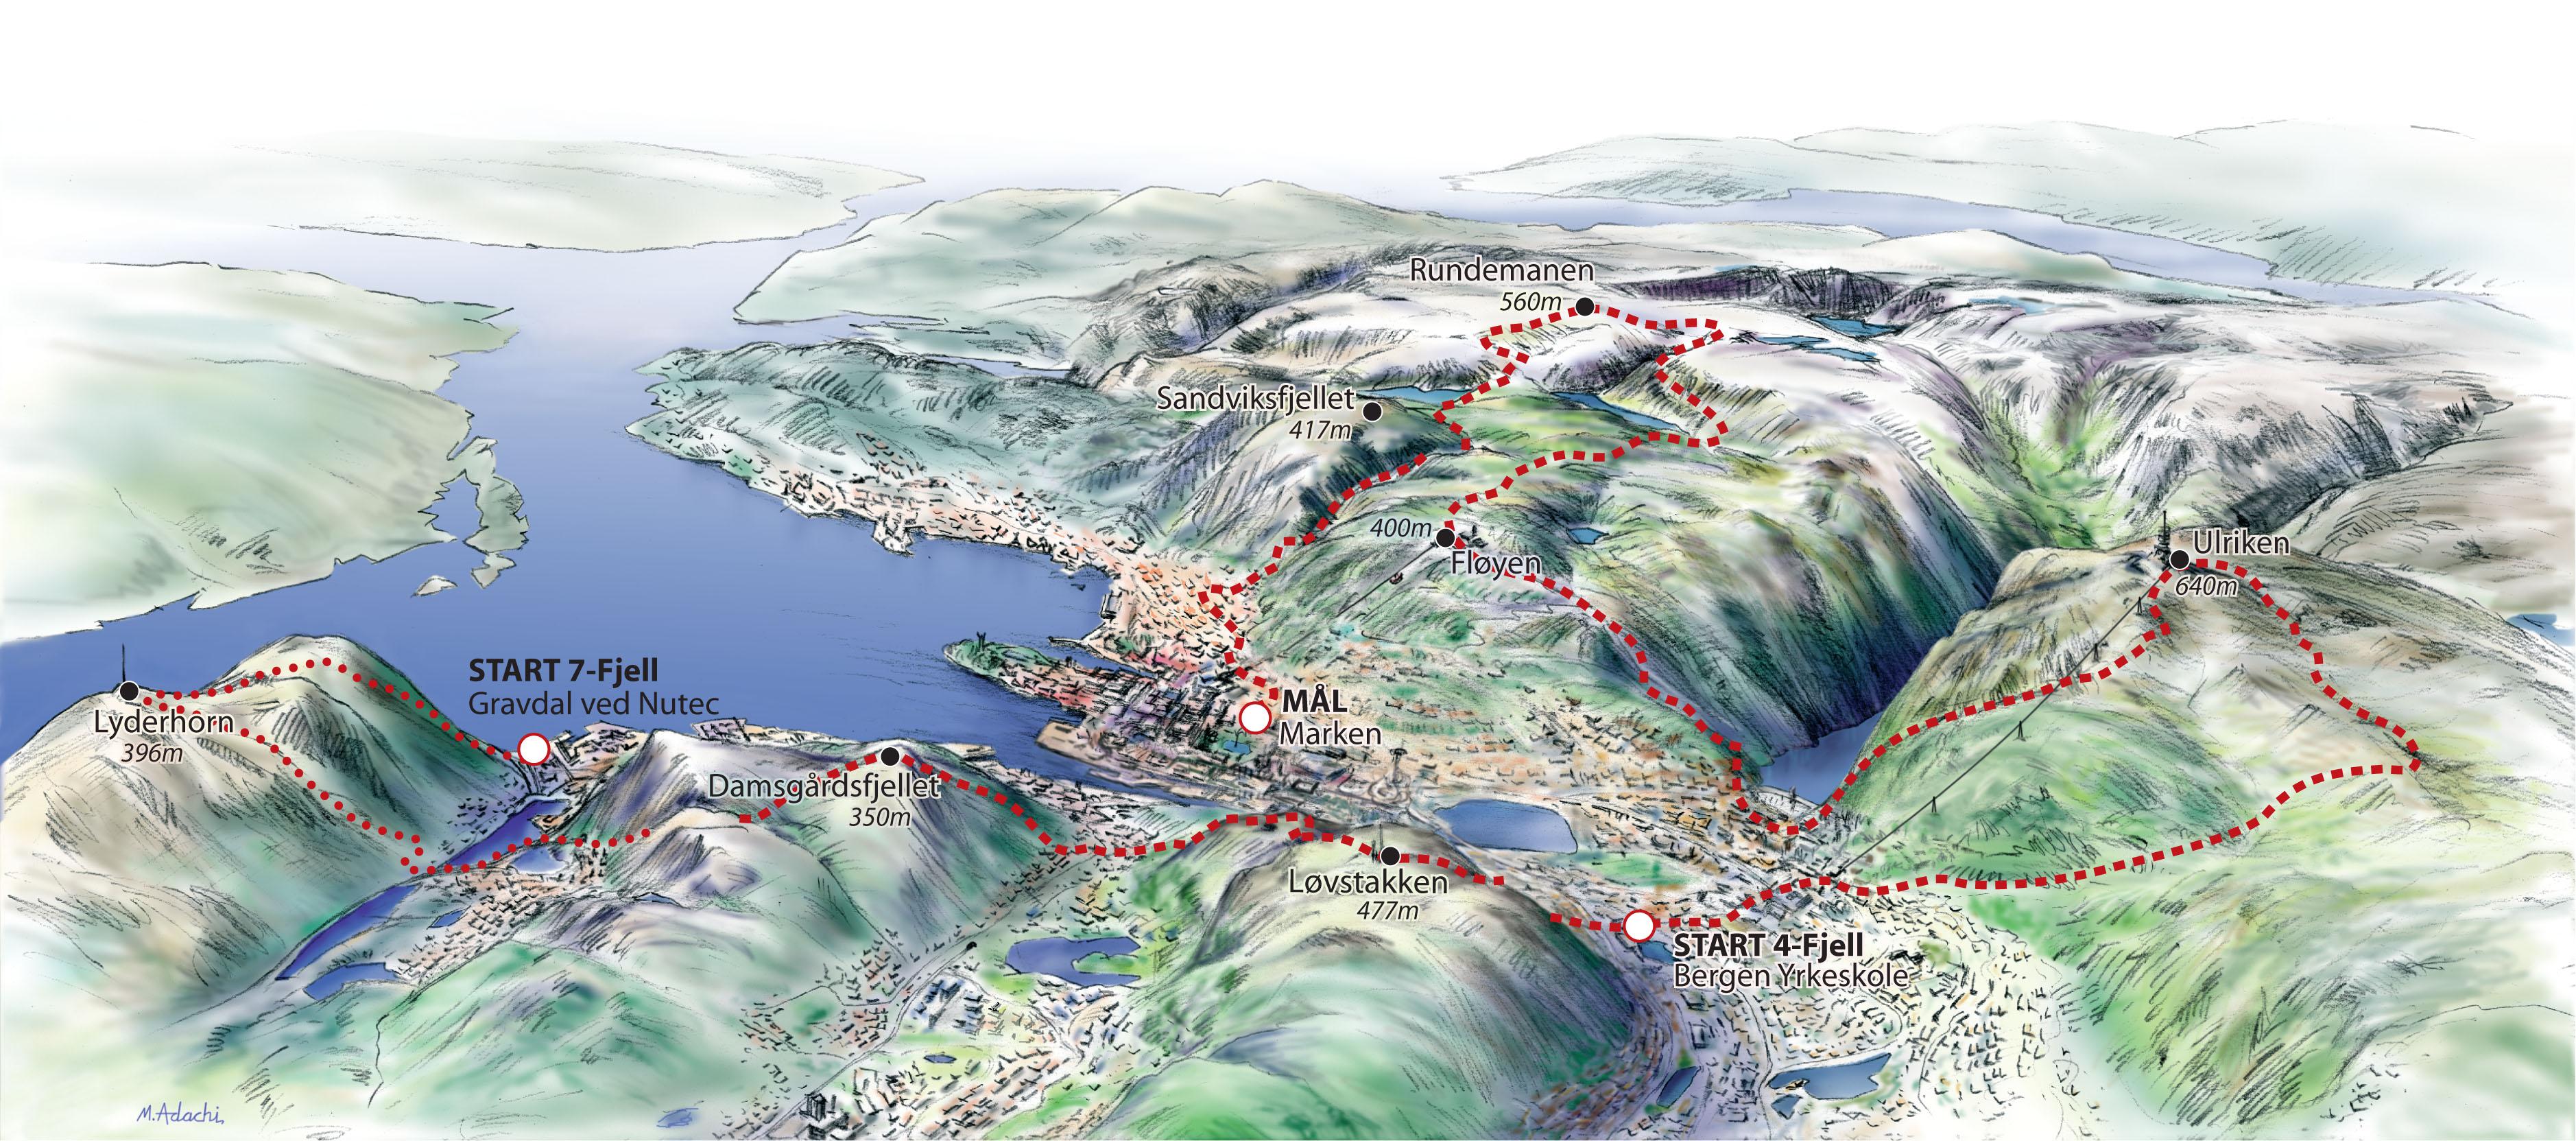 7-fjellsturen map